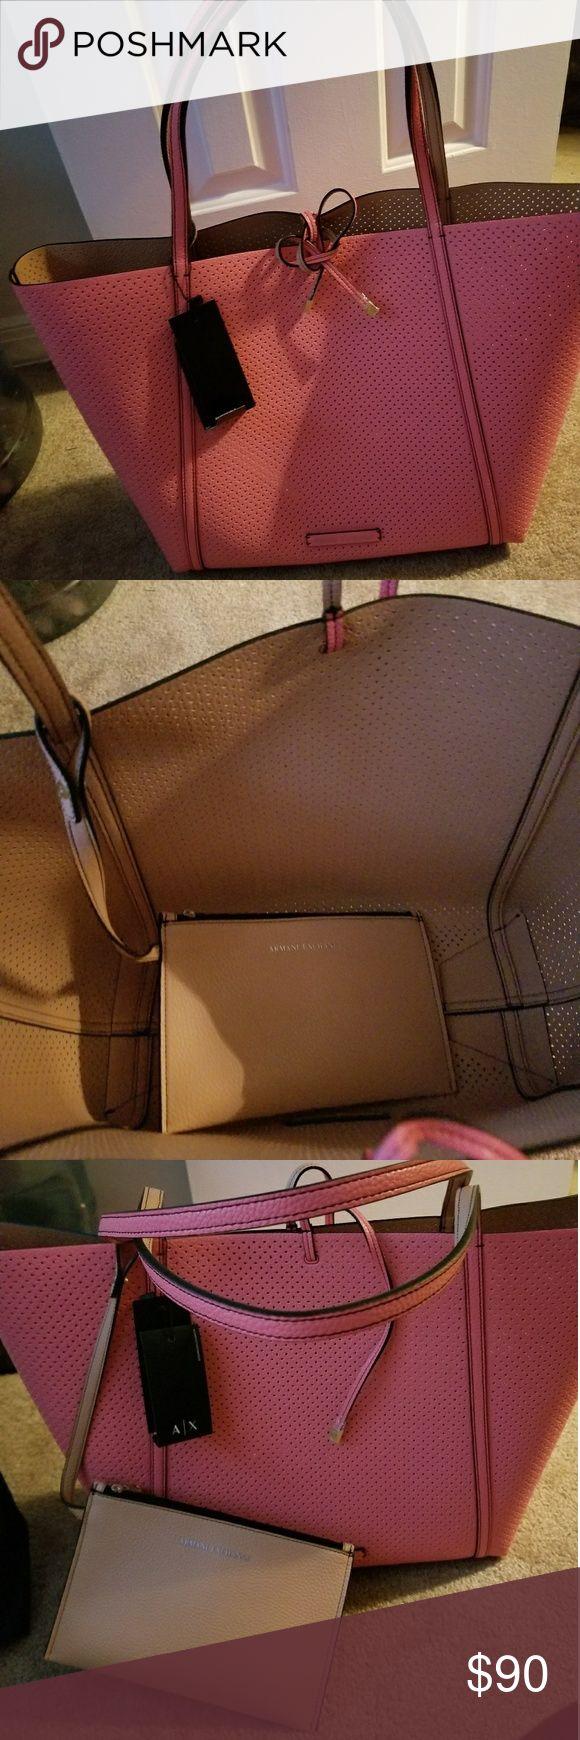 ARMANI EXCHANGE PURSE Brand New ARMANI EXCHANGE PURSE Reversible purse Armani Exchange Bags Totes